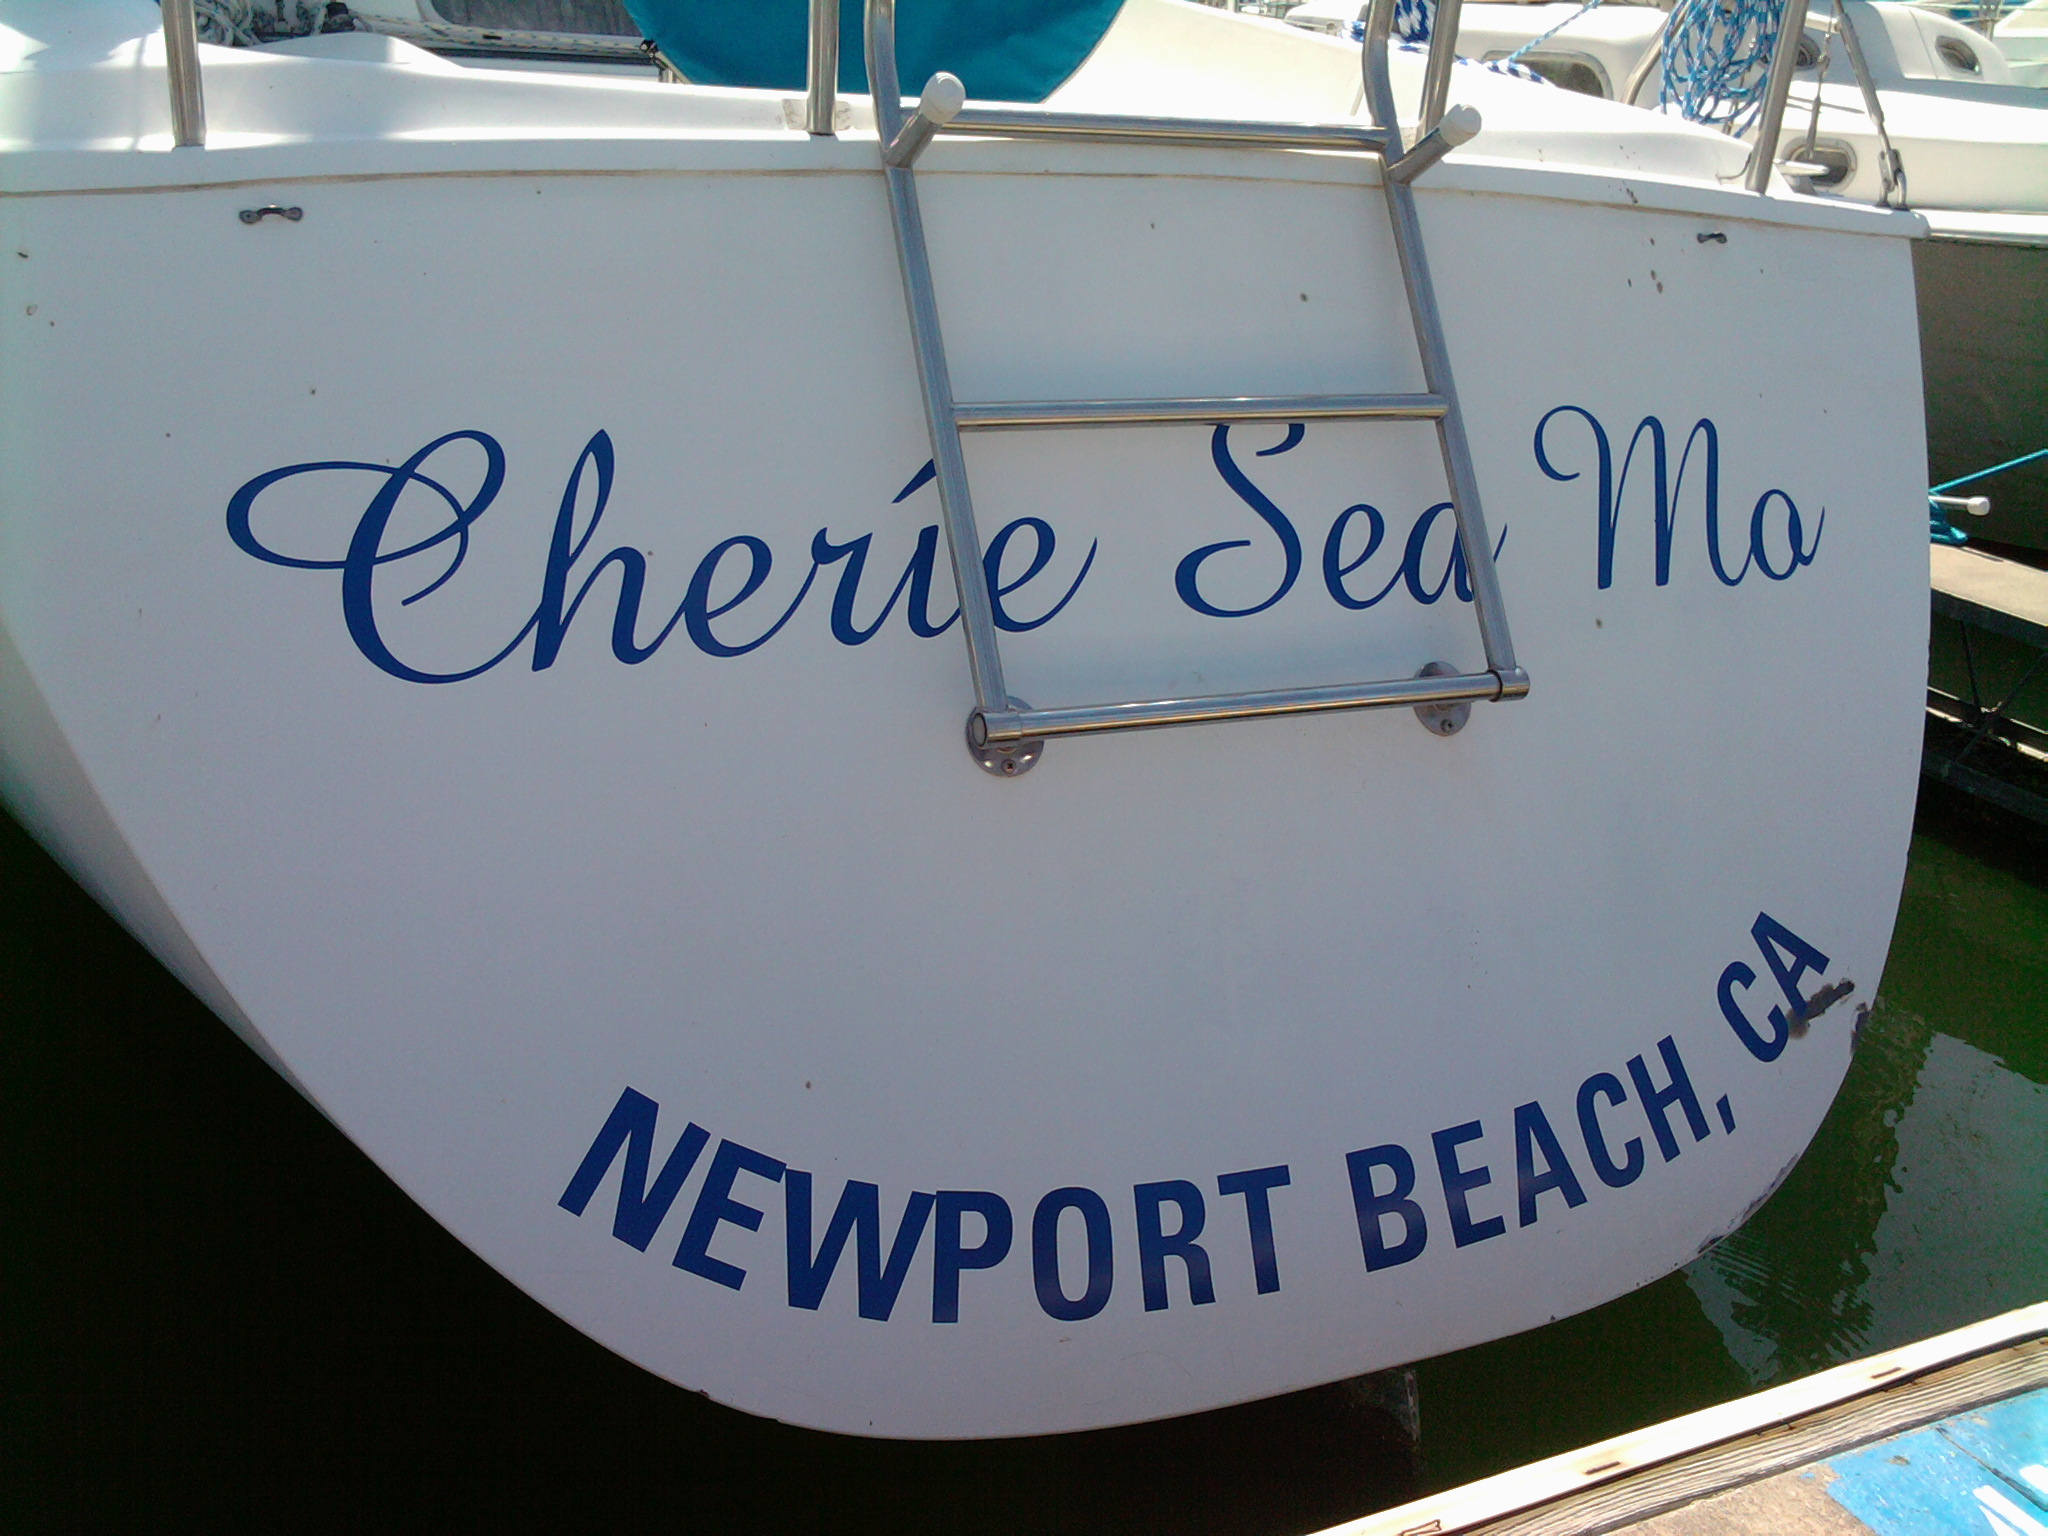 Cherie Sea Ma